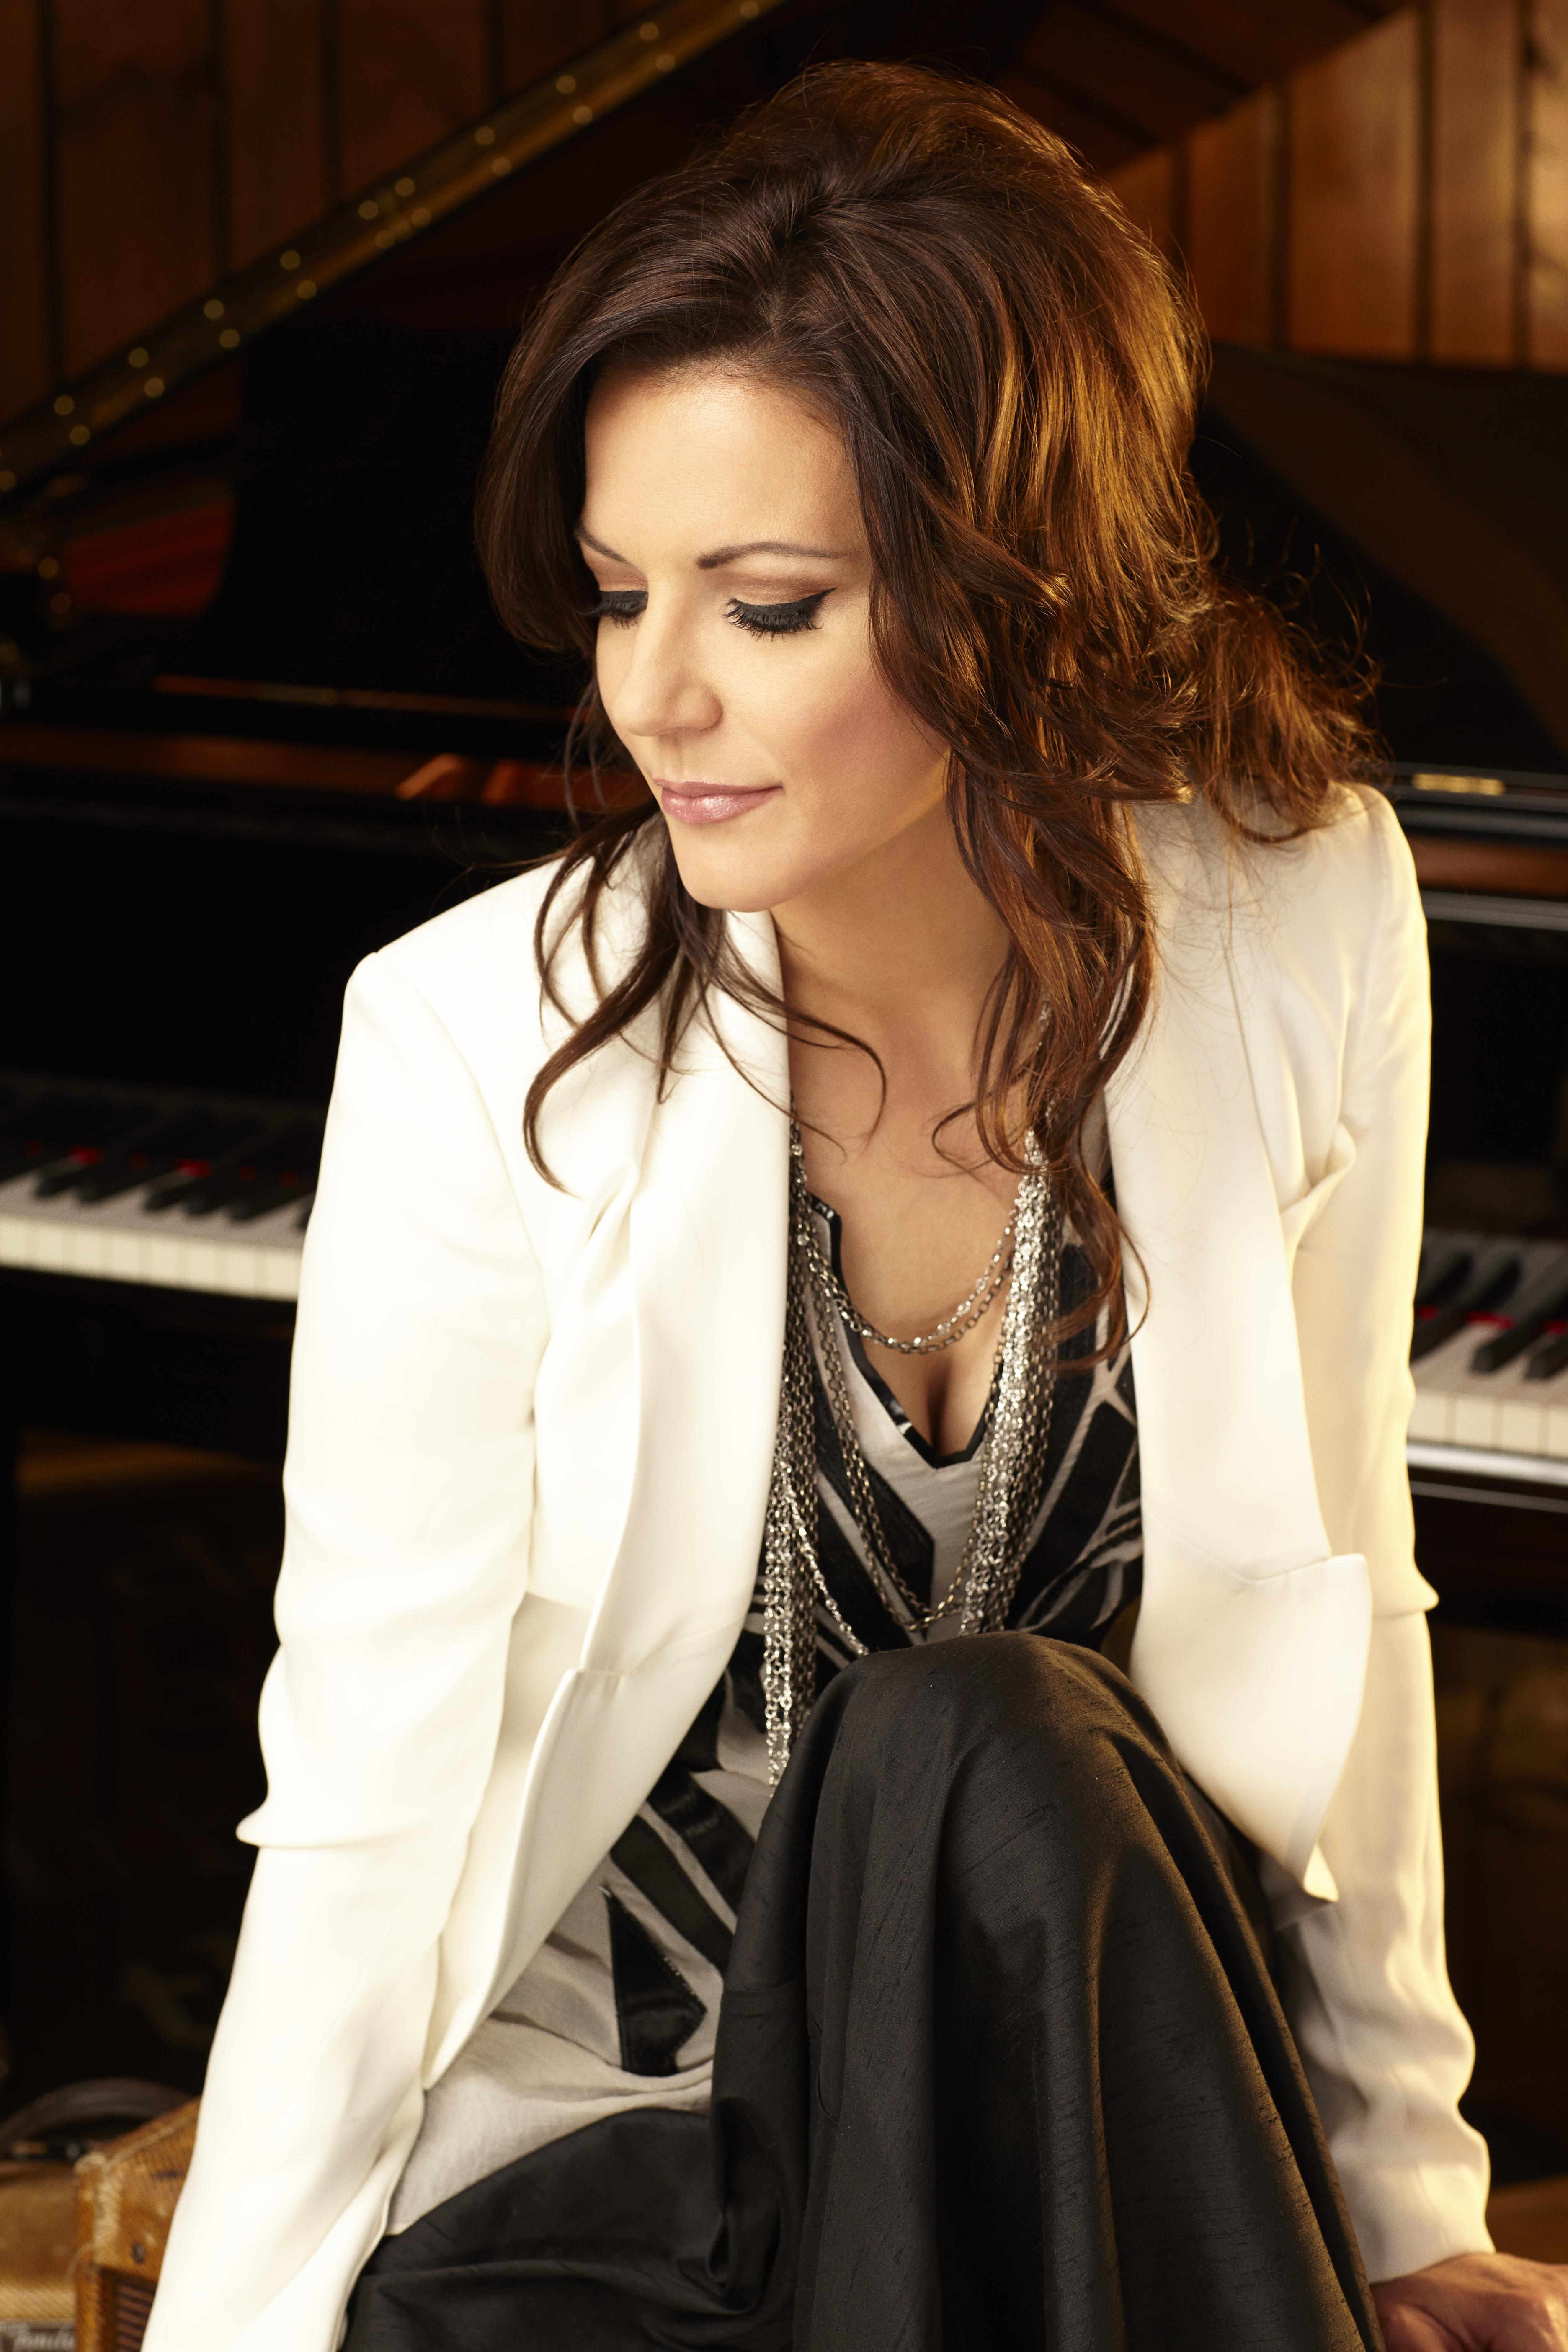 Martina Mcbride Pics, Music Collection